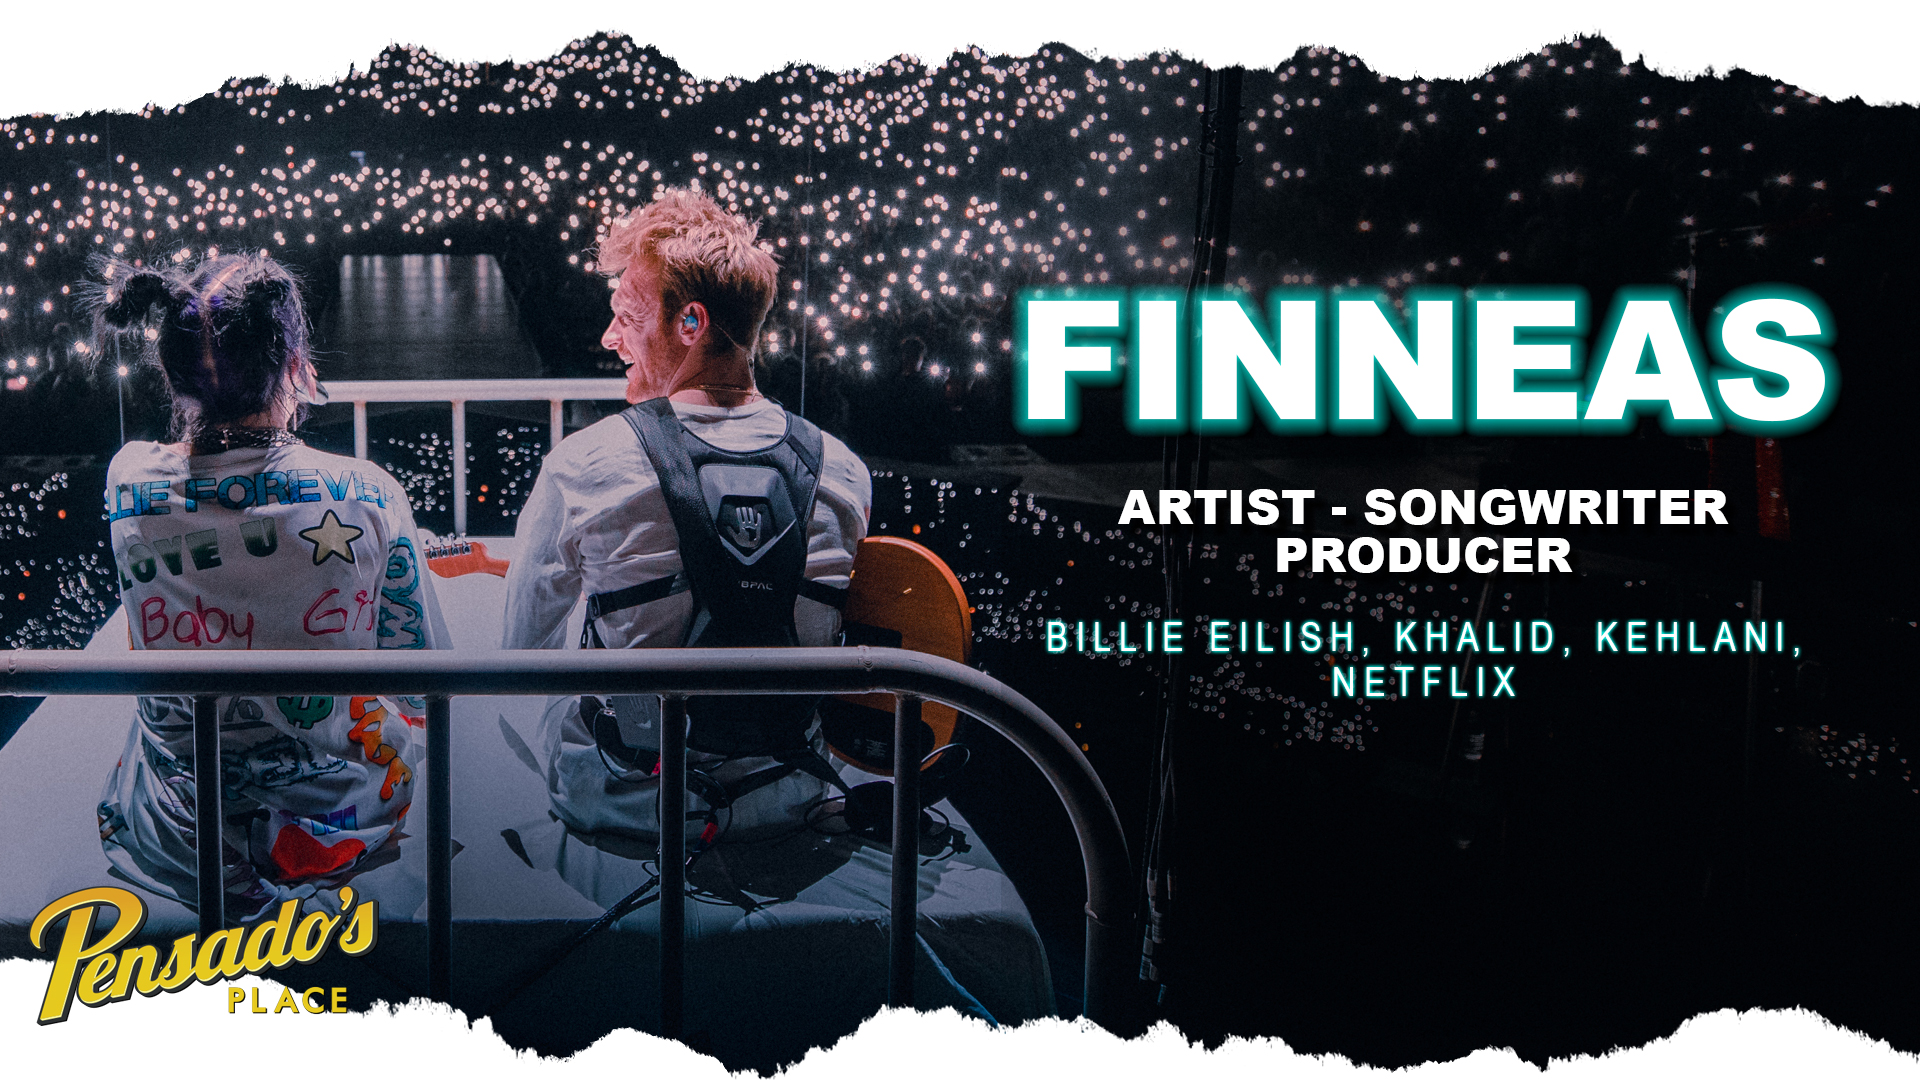 Artist / Songwriter / Producer, FINNEAS